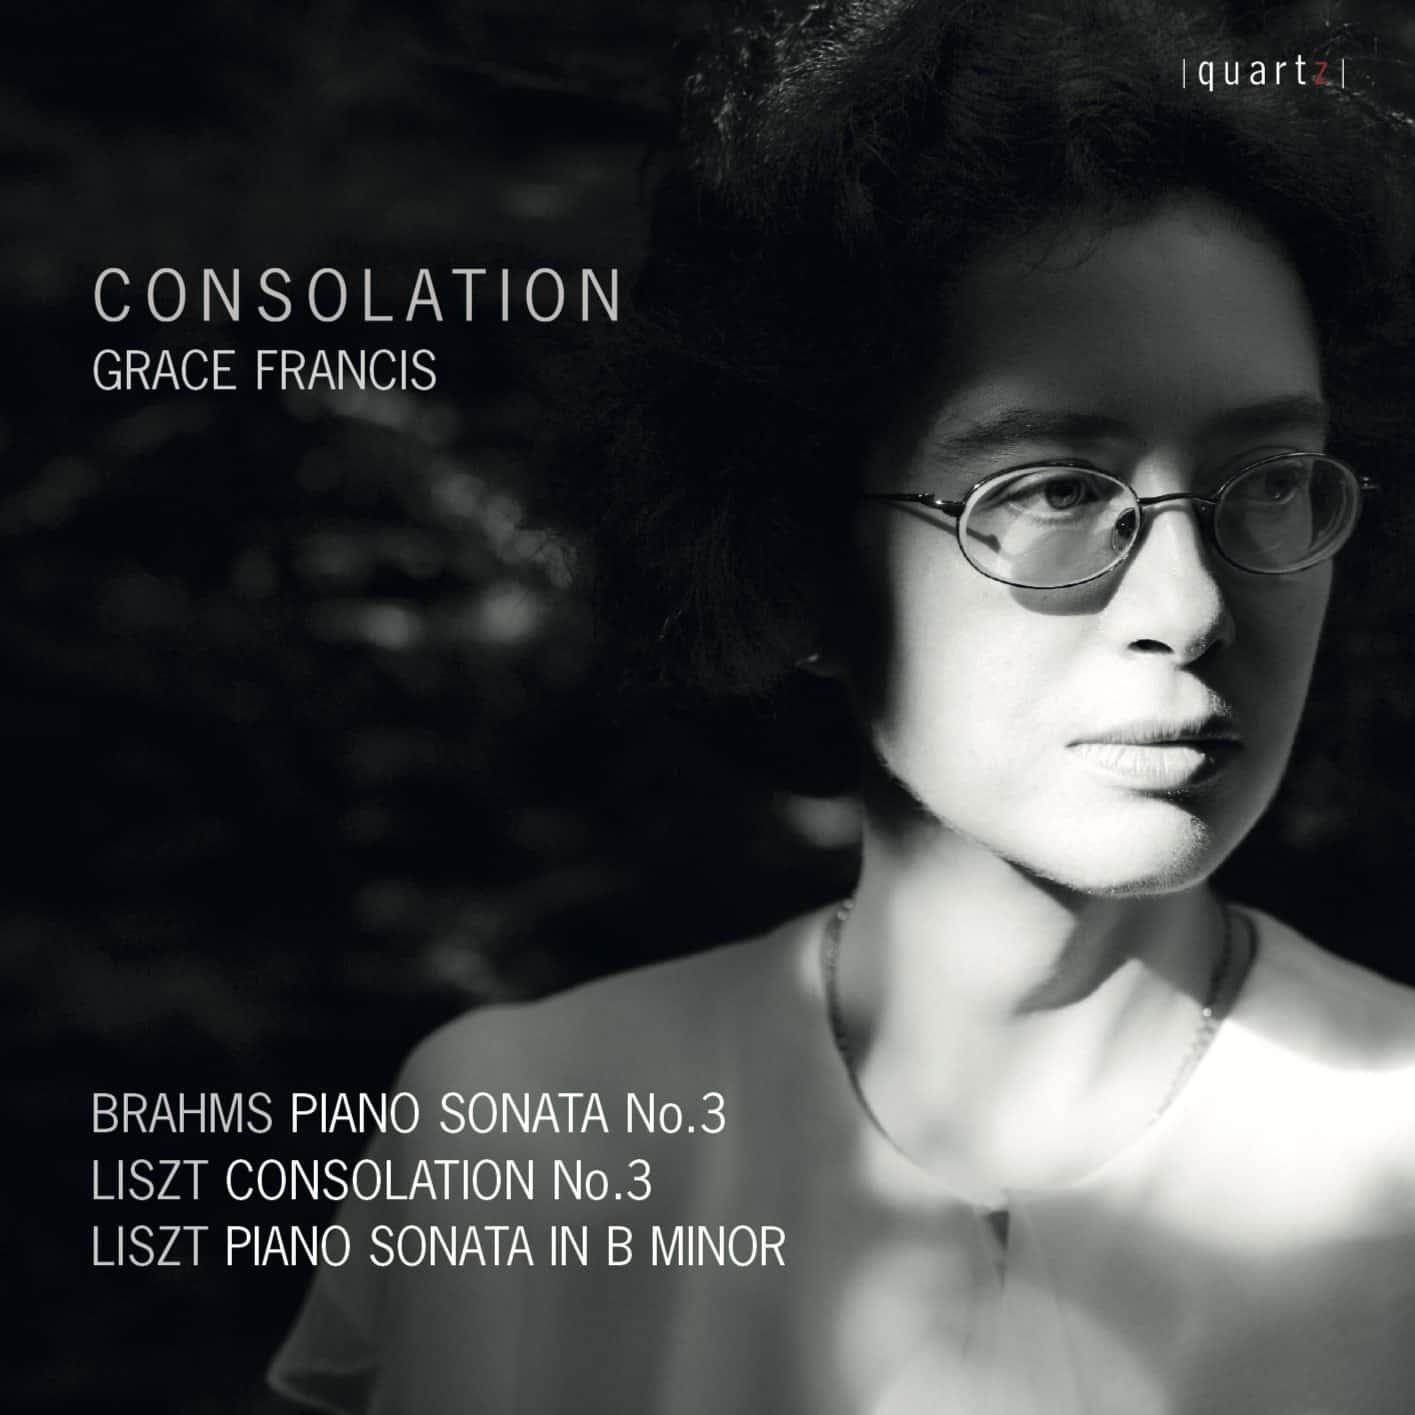 Grace Francis: Consolation